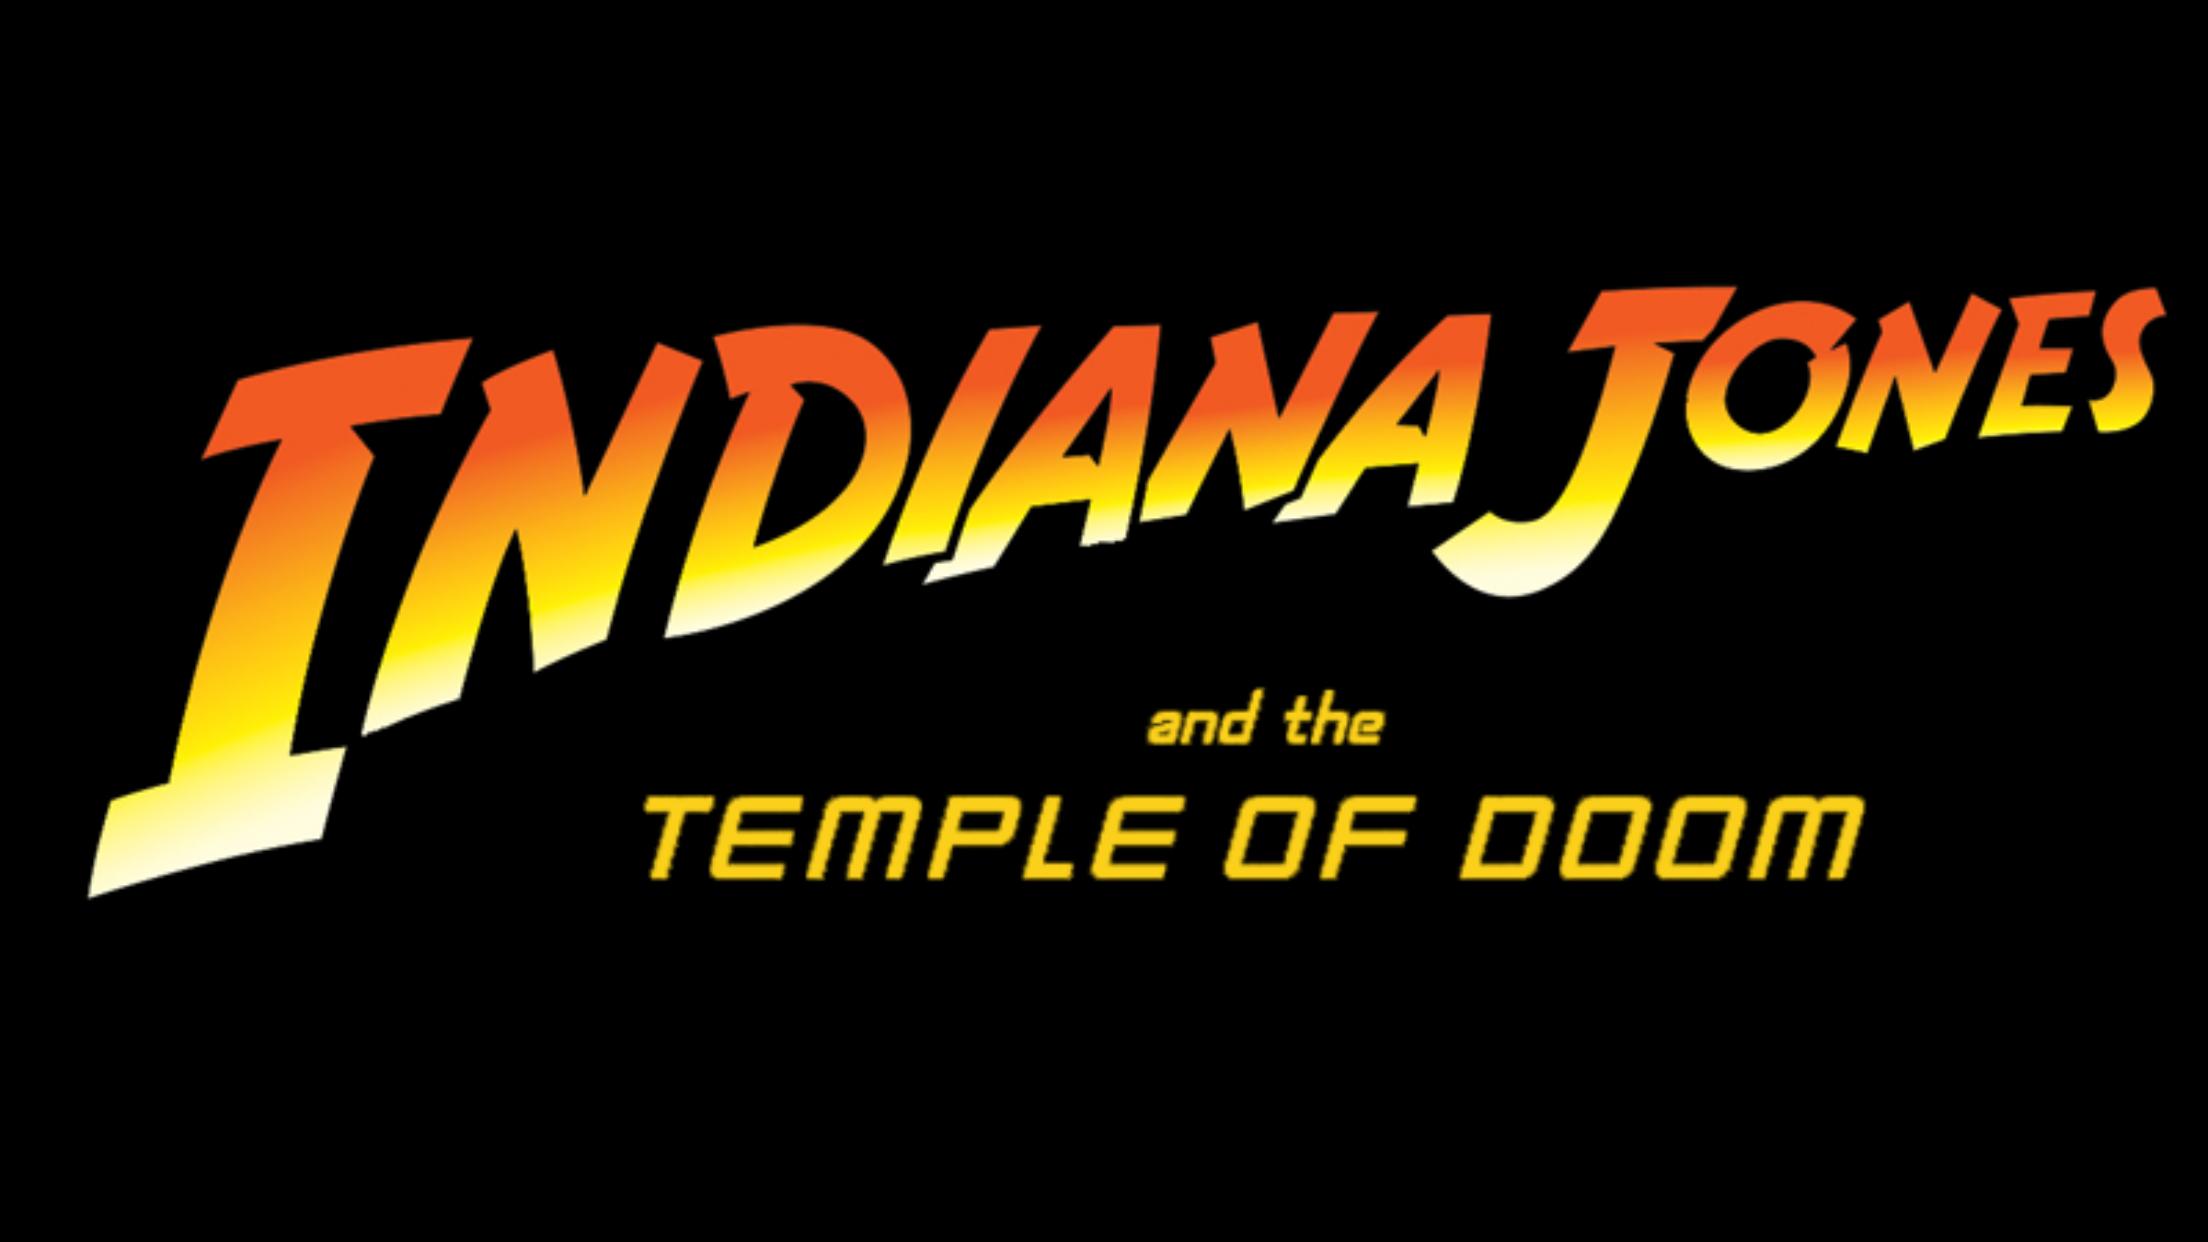 Pin By Theparademon14 On Indiana Jones Indiana Jones Indiana Crusade